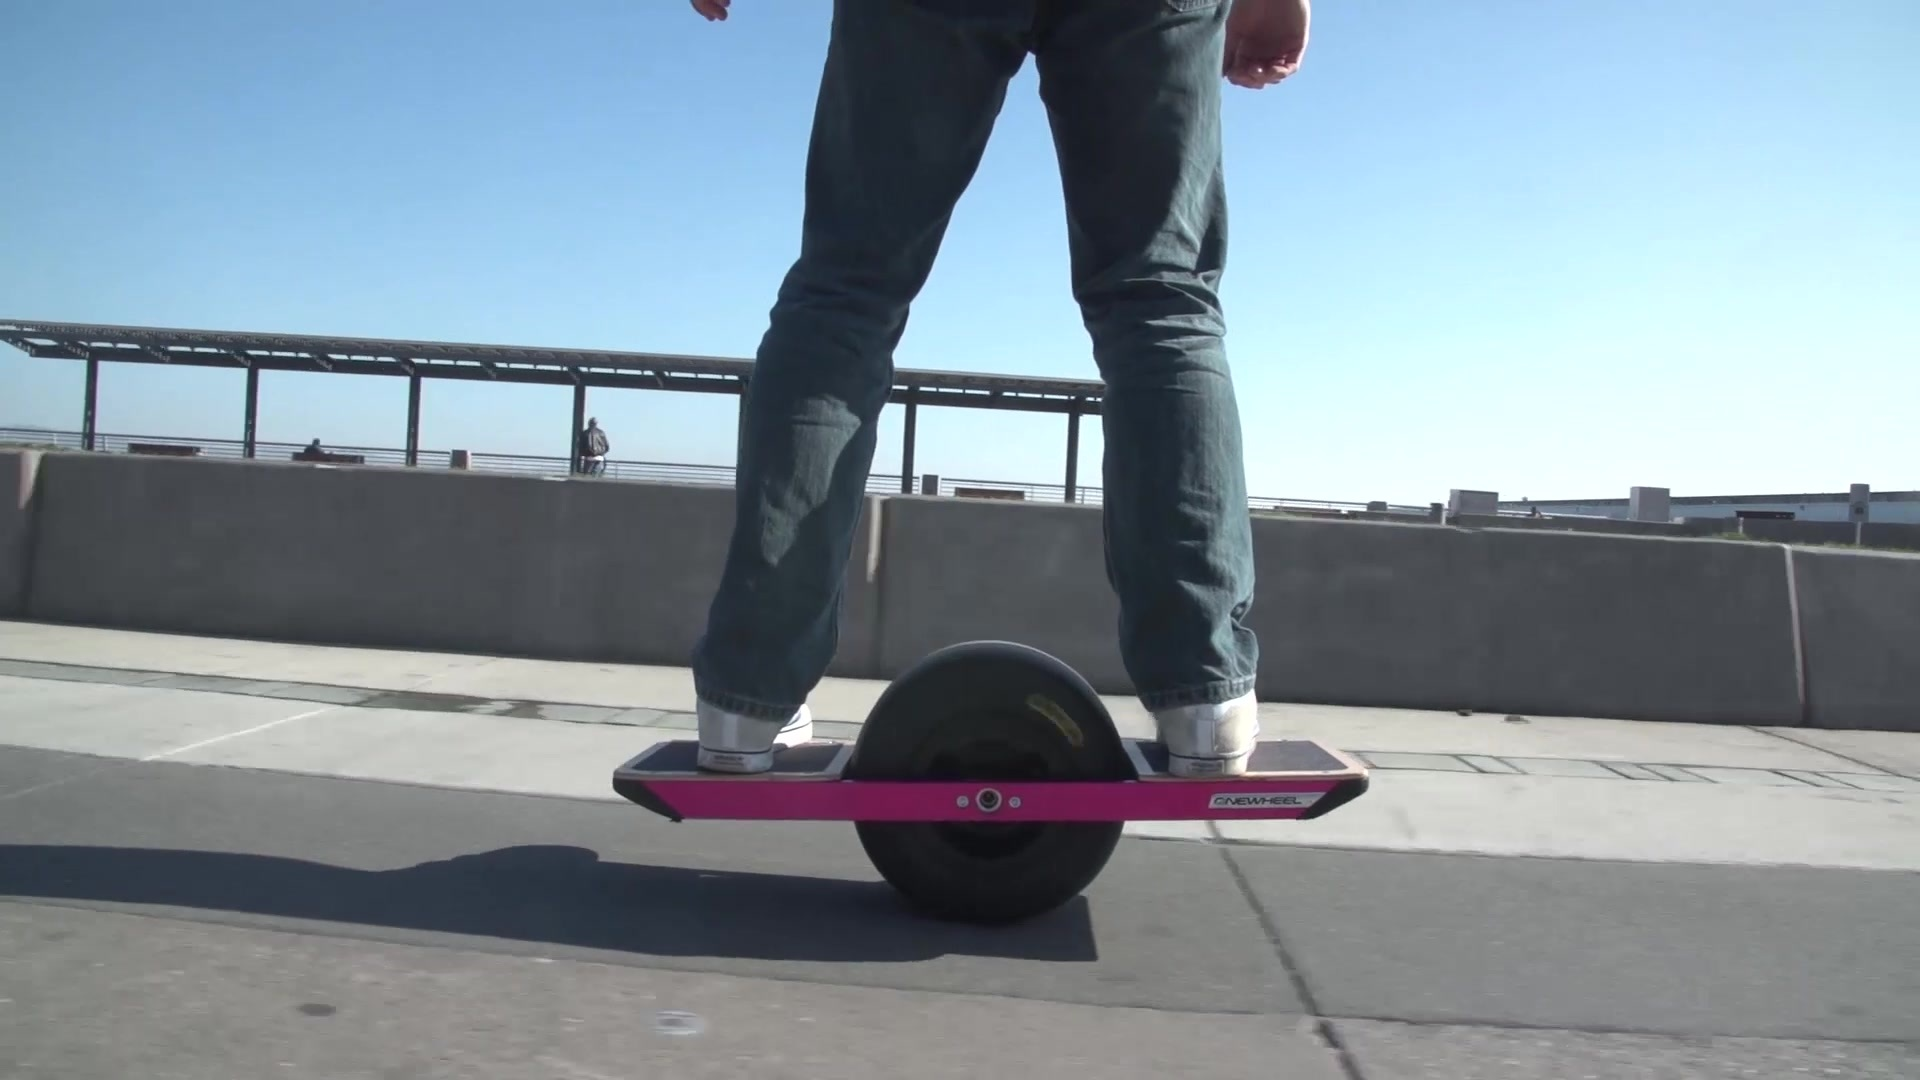 Onewheel Self-Balancing Electric Skateboard